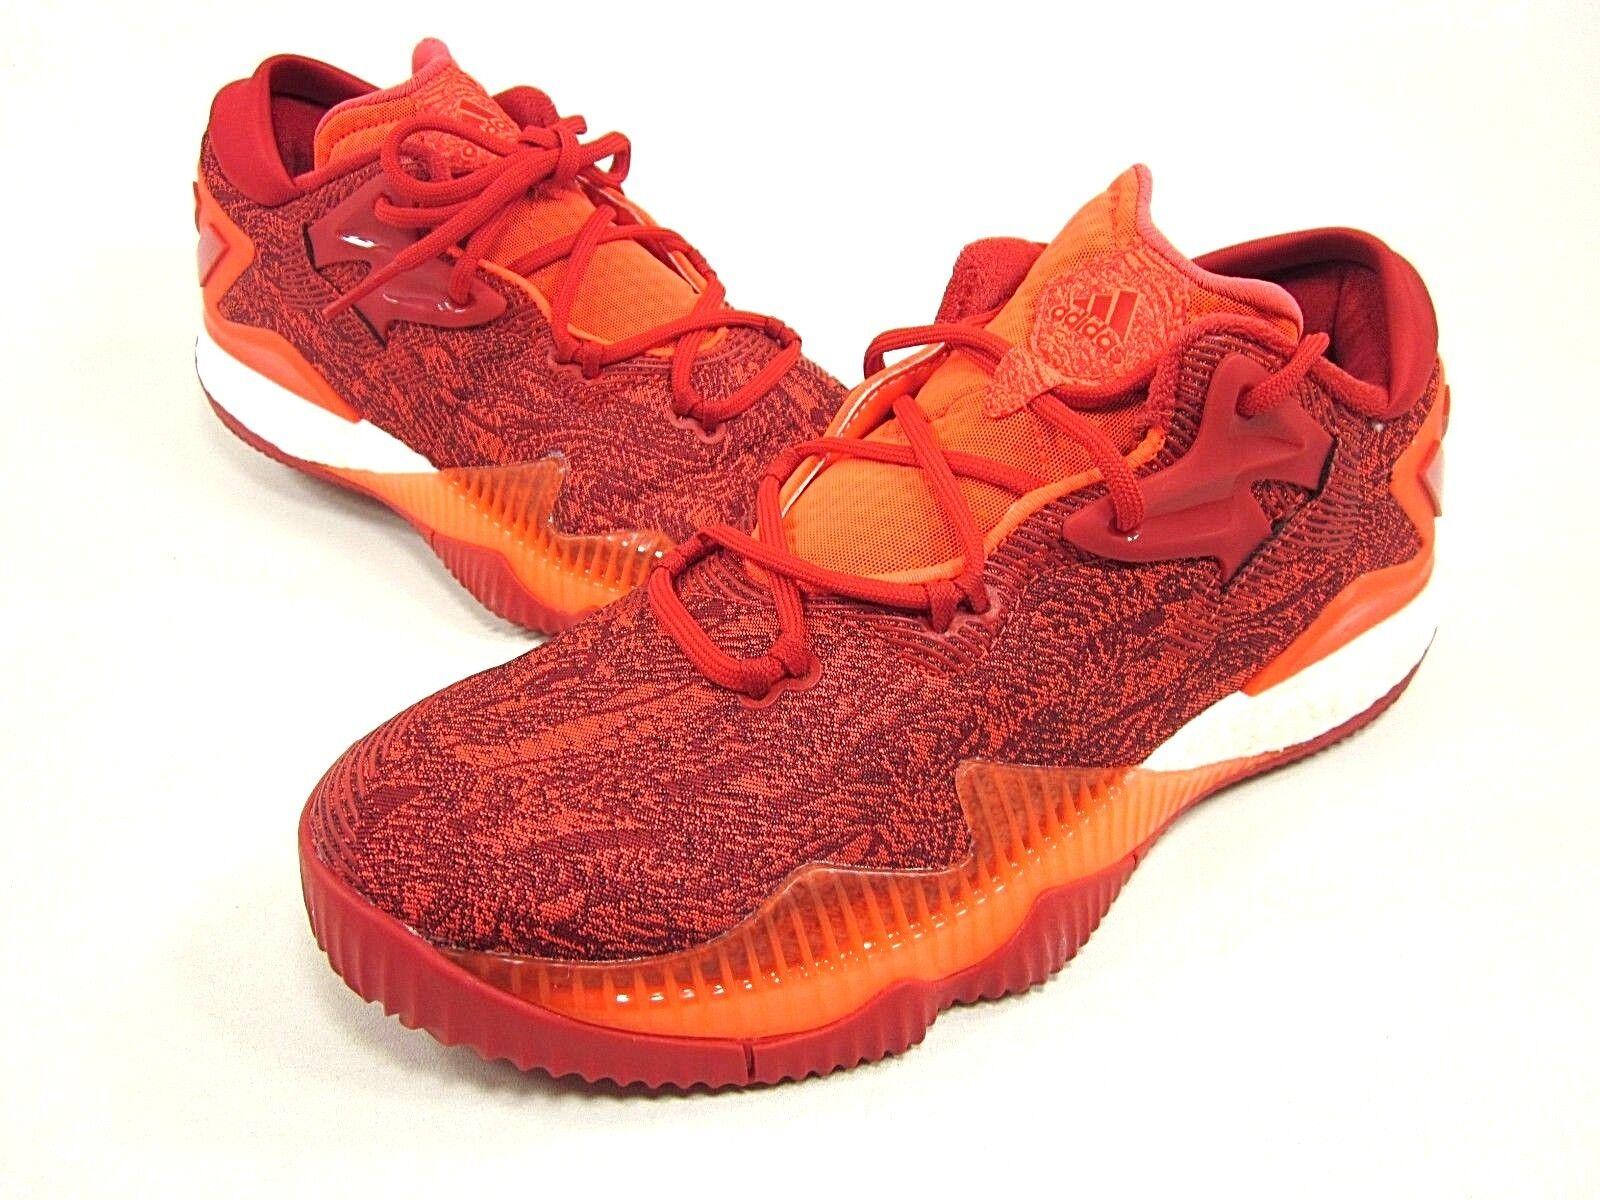 Adidas hombres crazylight Boost baja 2018 hombres Adidas zapatos de baloncesto b42389 tamaño 11,5, liquidación de temporada 5b55ab